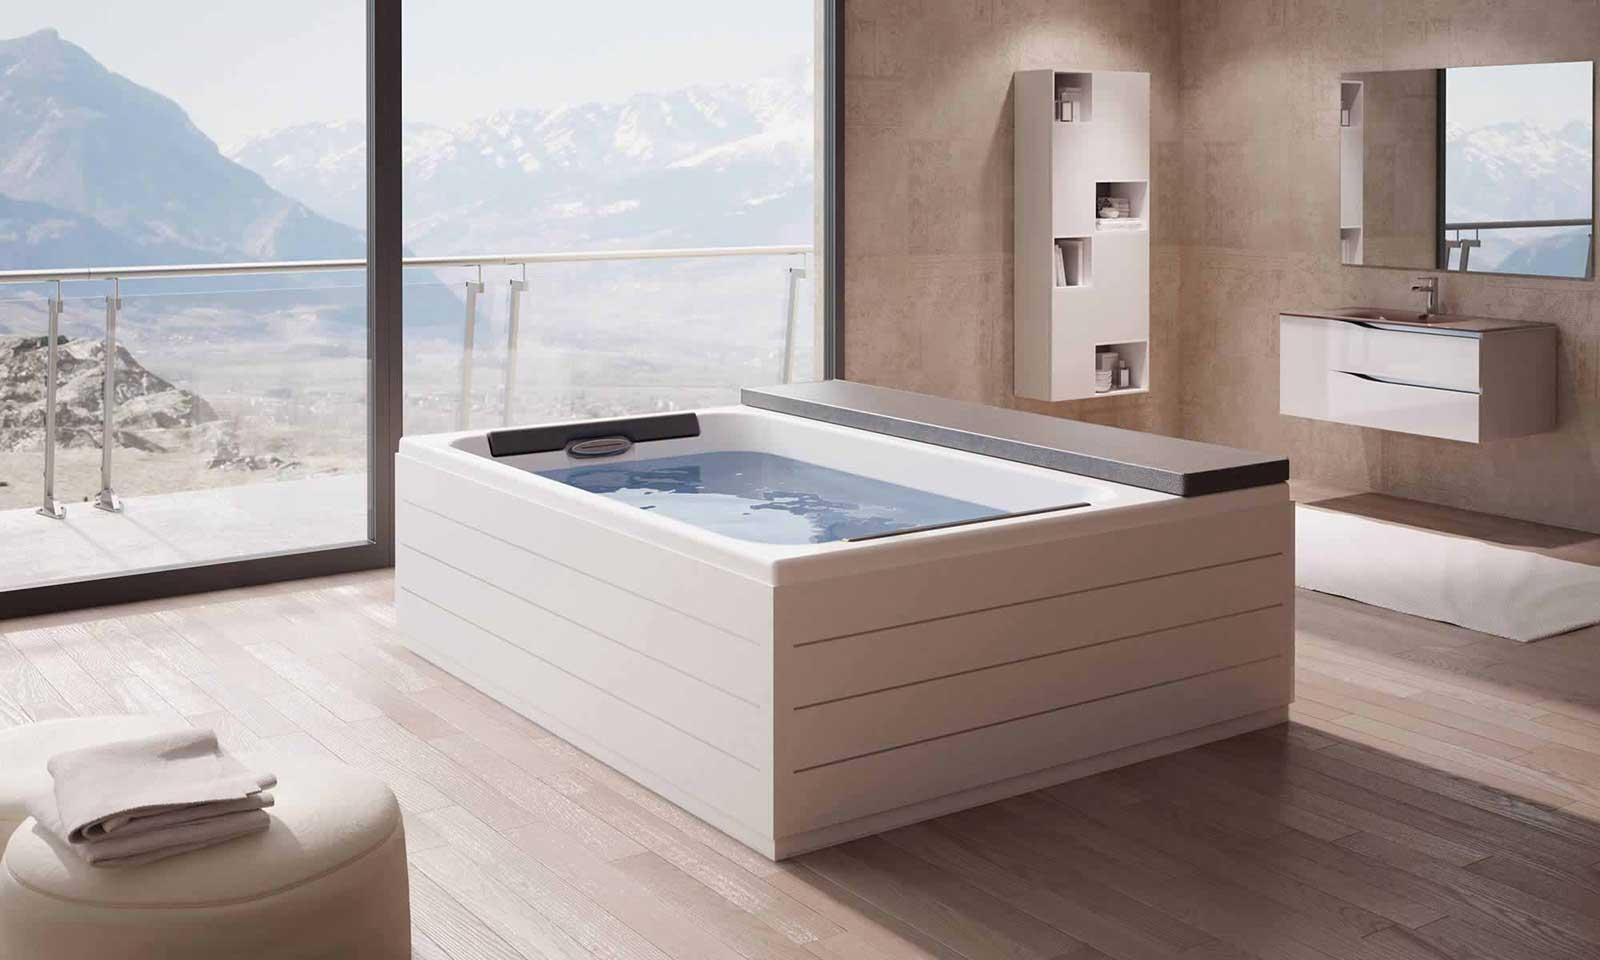 Vasca Da Bagno Grandform : Vasche idromassaggio grandform u termosanitaria bra